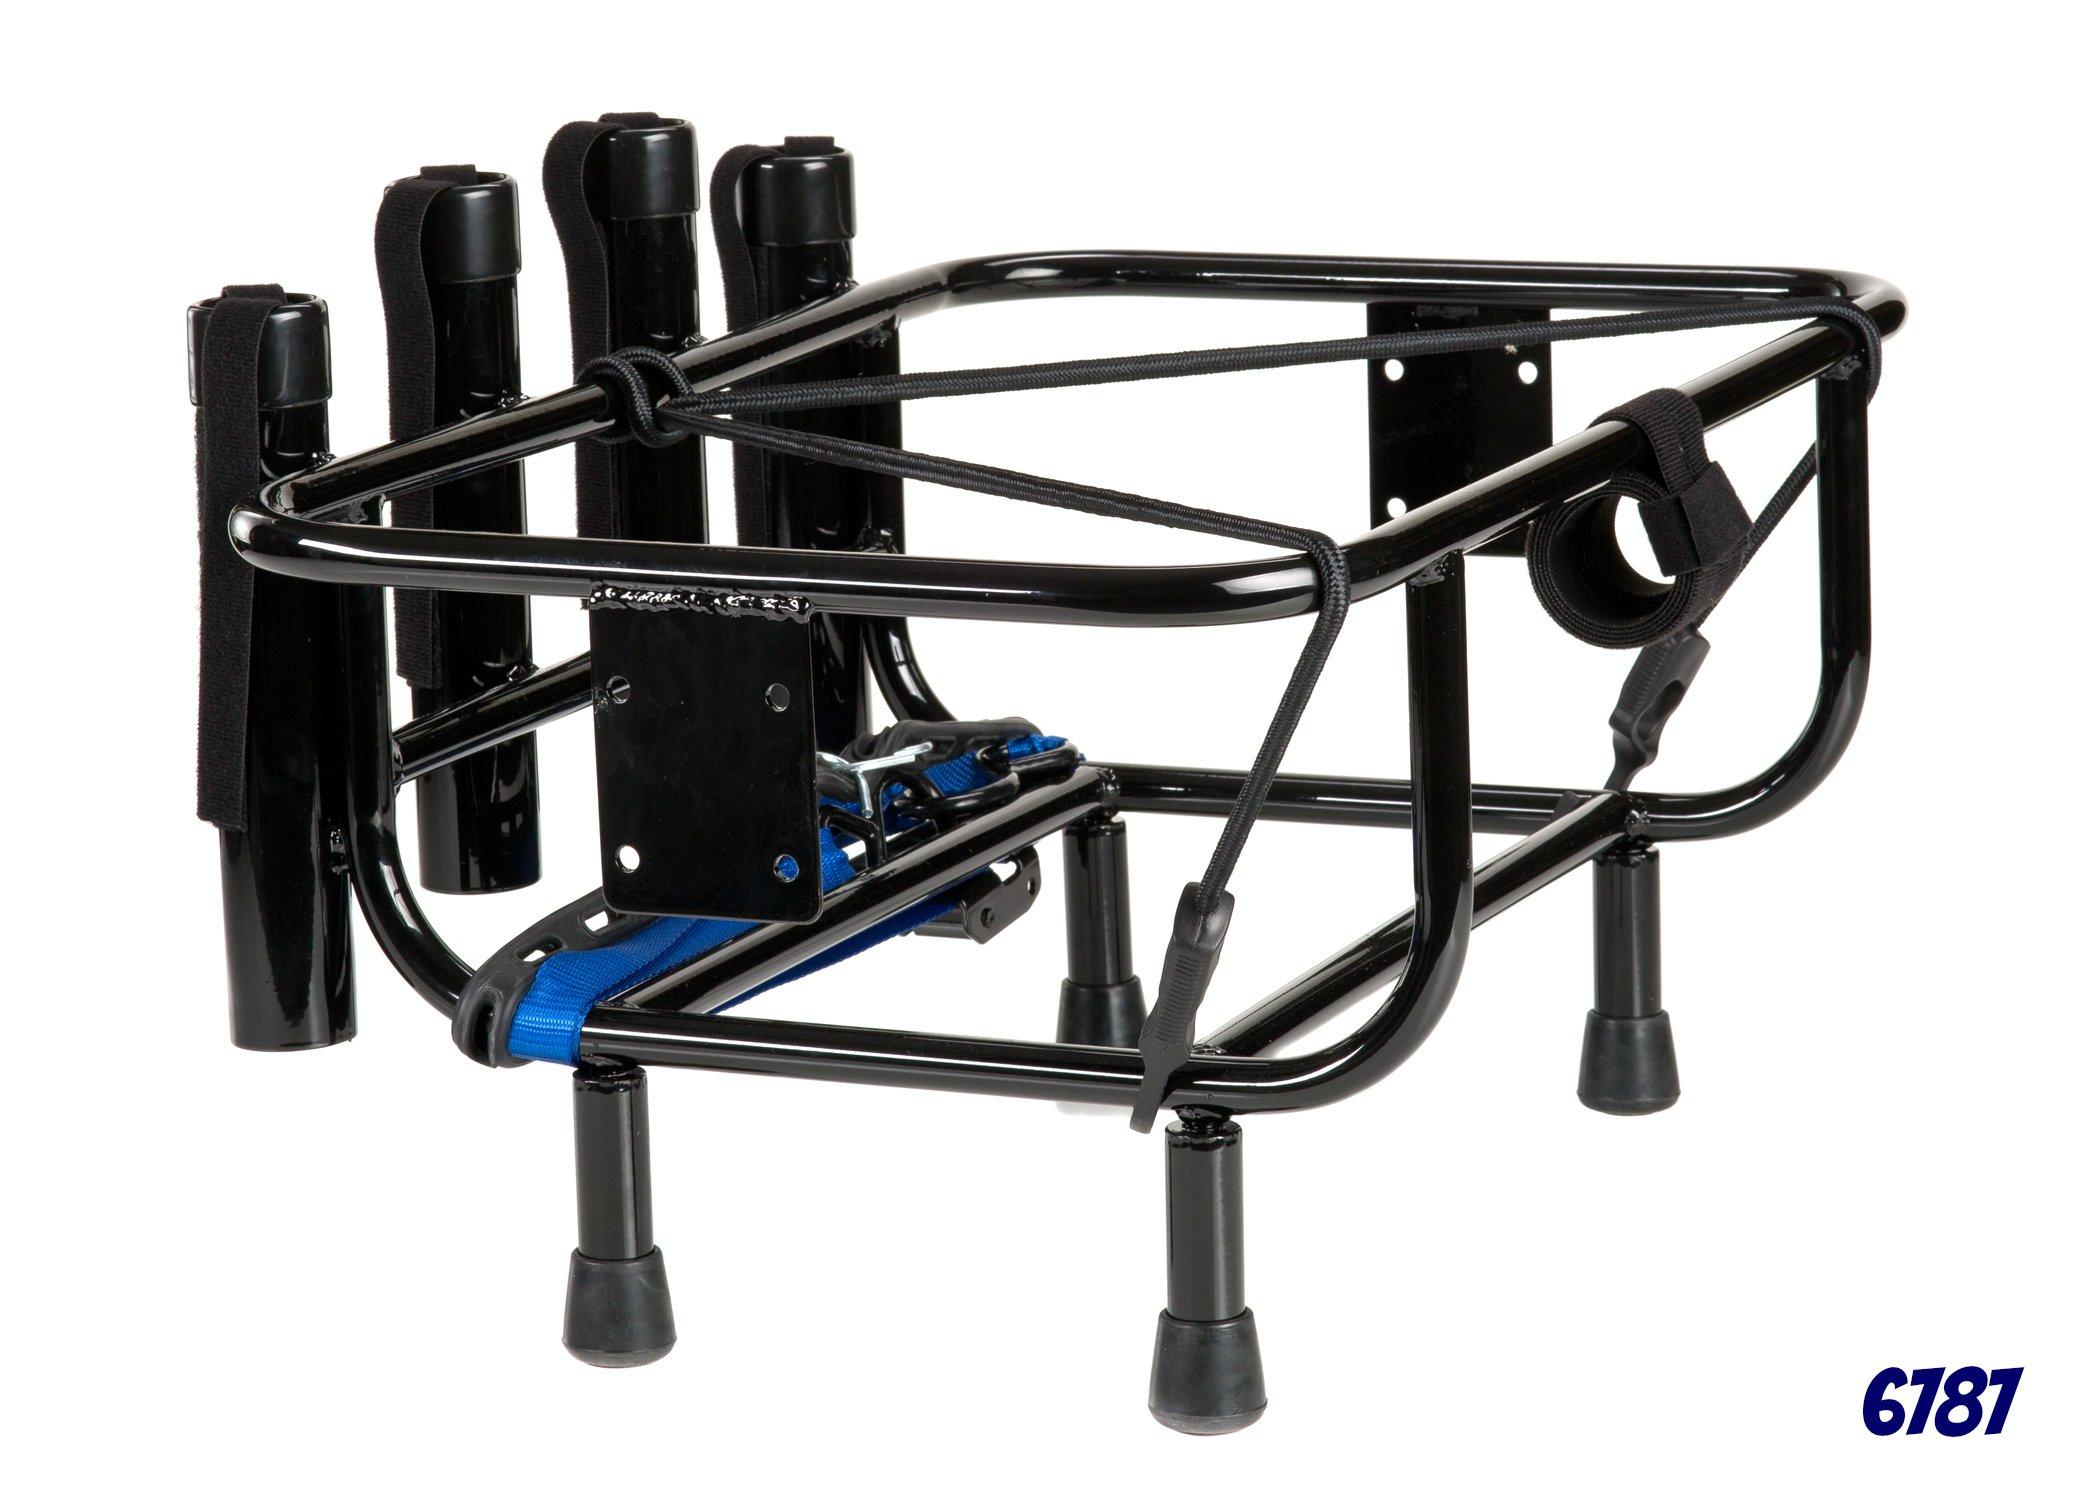 Jetski Fishing Rack with 4 Rod Holders